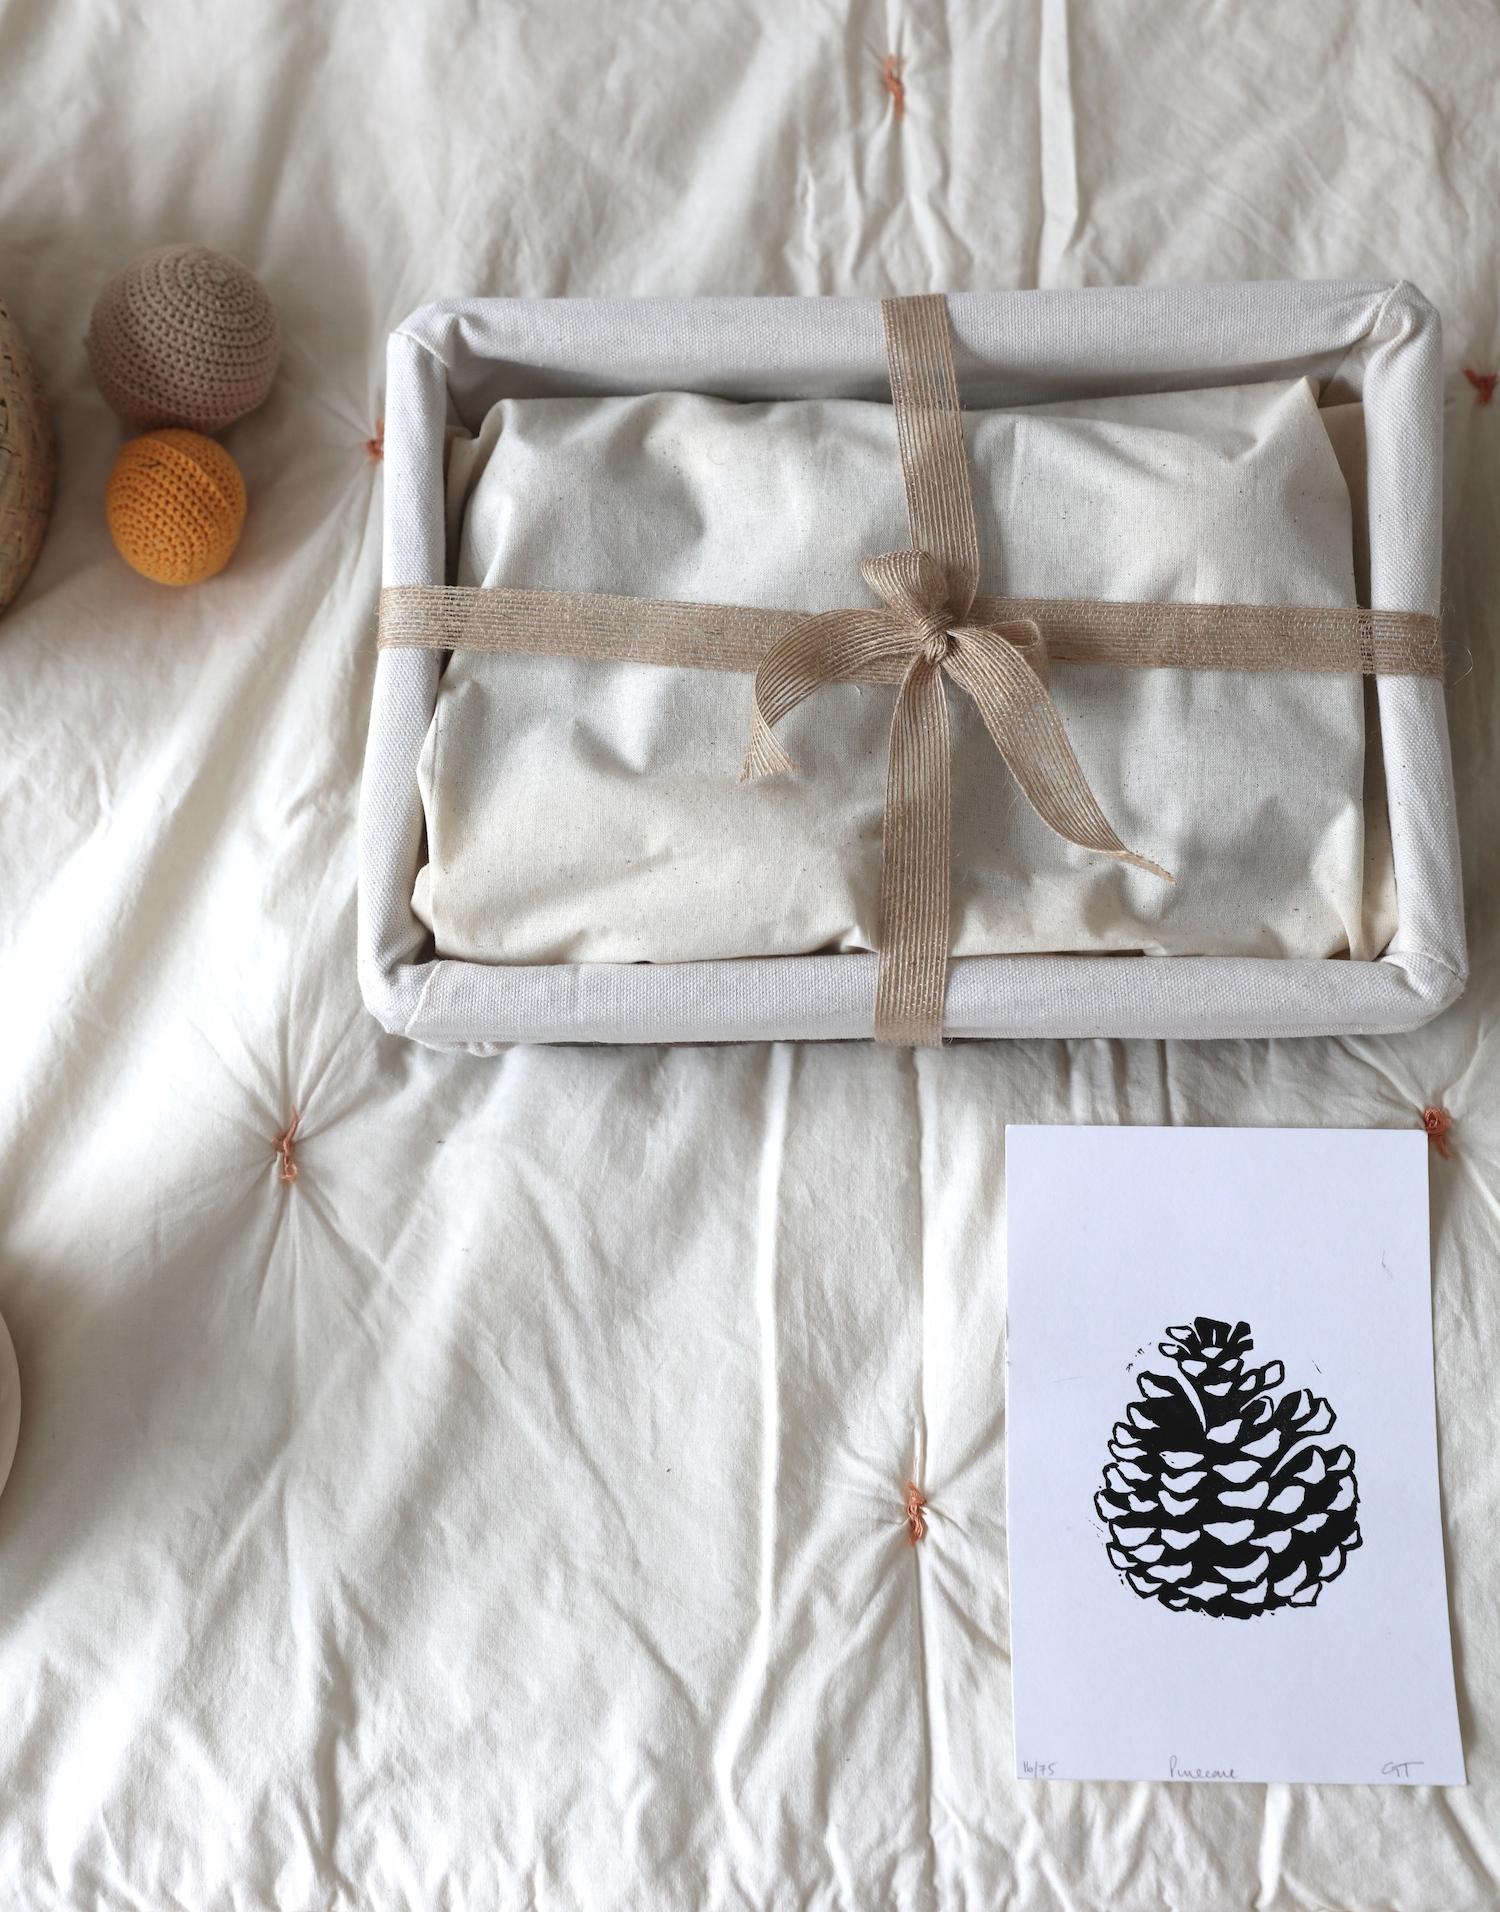 grasp_and-gather_baby_sensory_basket_montessori_natural